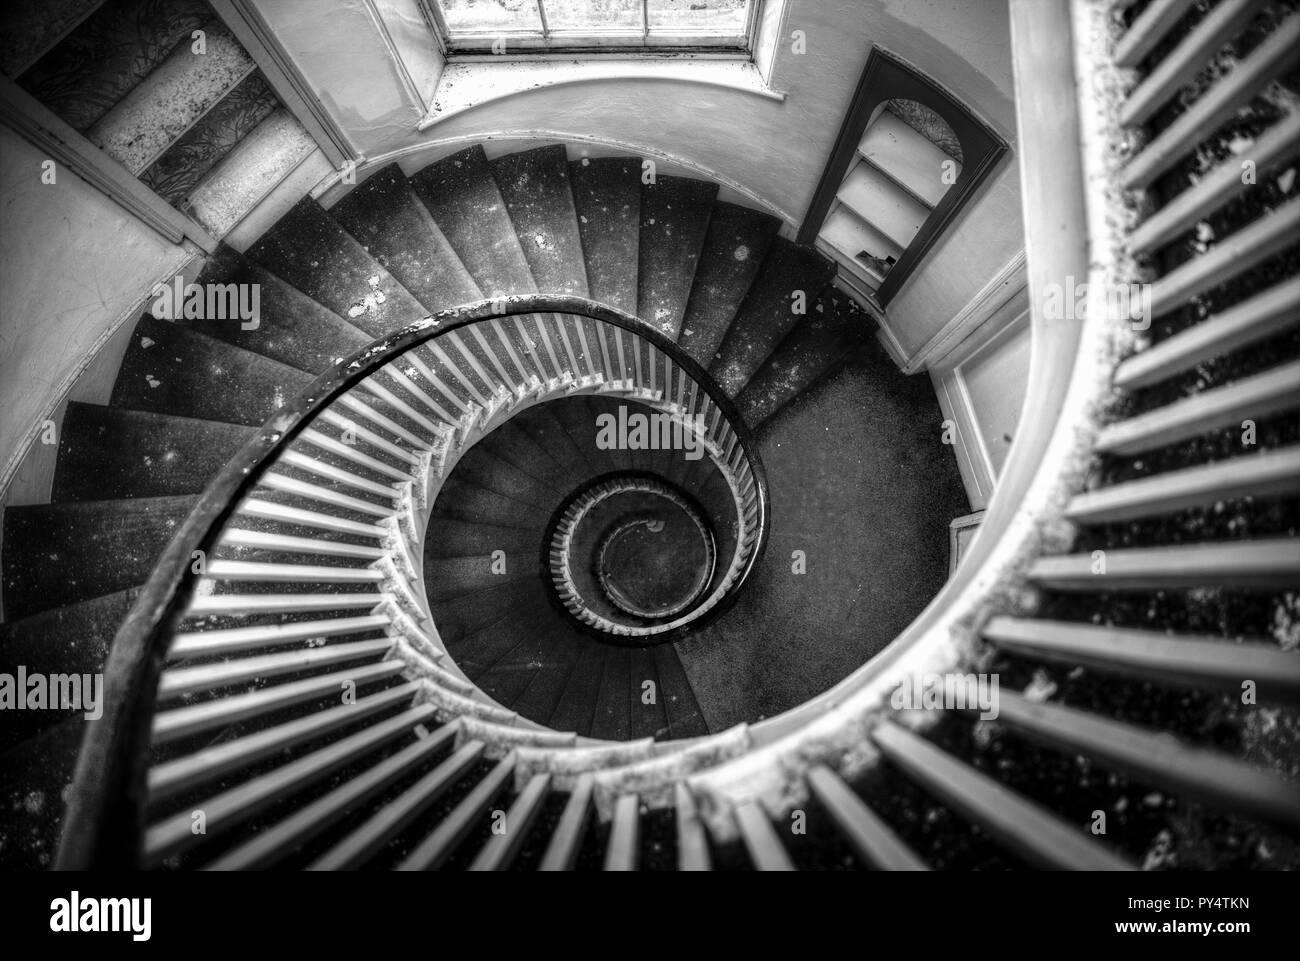 Escalera De Caracol Escaleras En Espiral Escalera De Caracol De - Escaleras-en-espiral